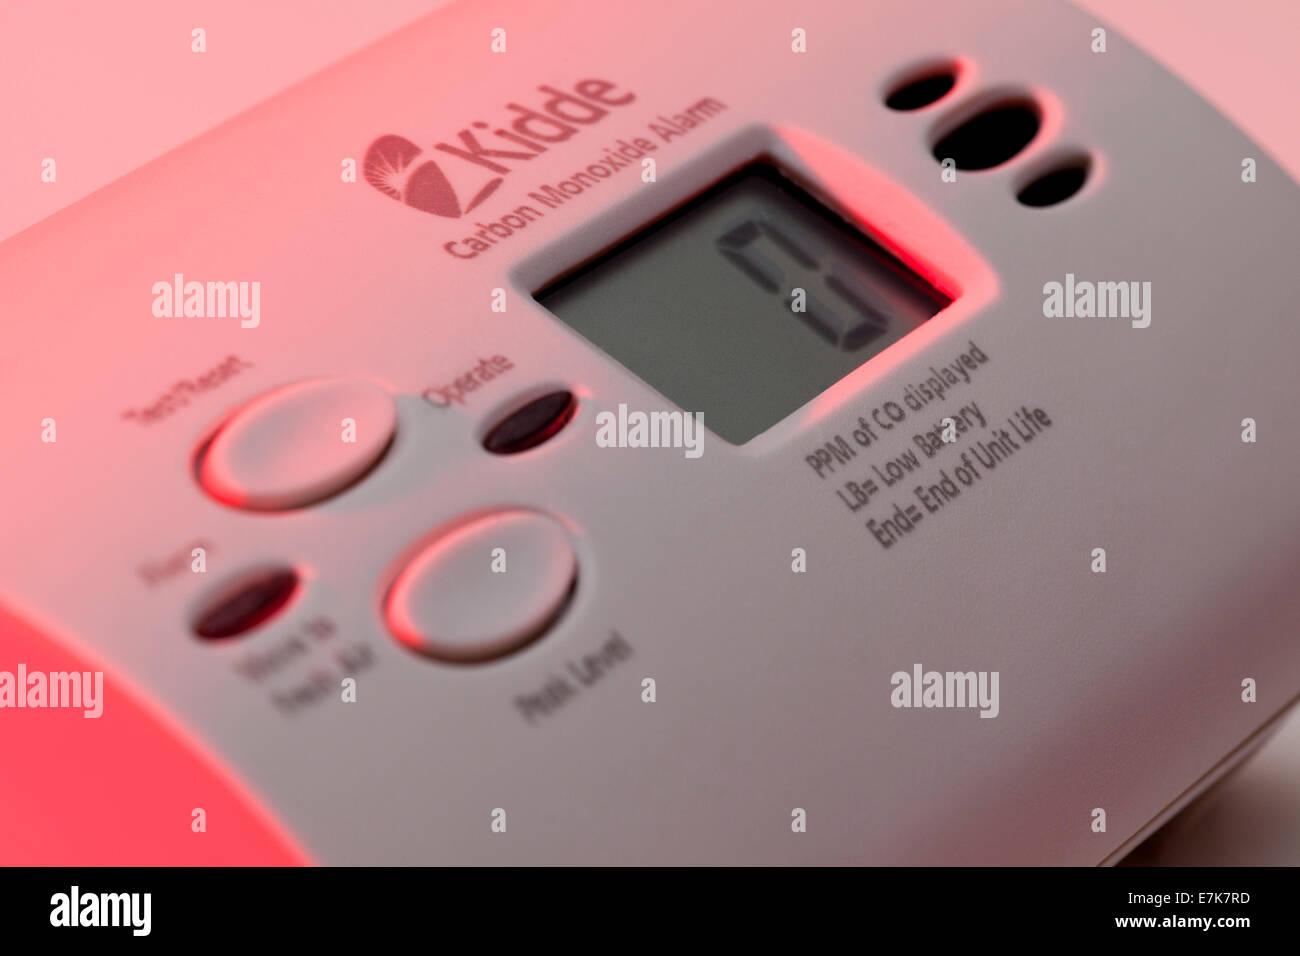 Kidde carbon monoxide alarm - USA - Stock Image